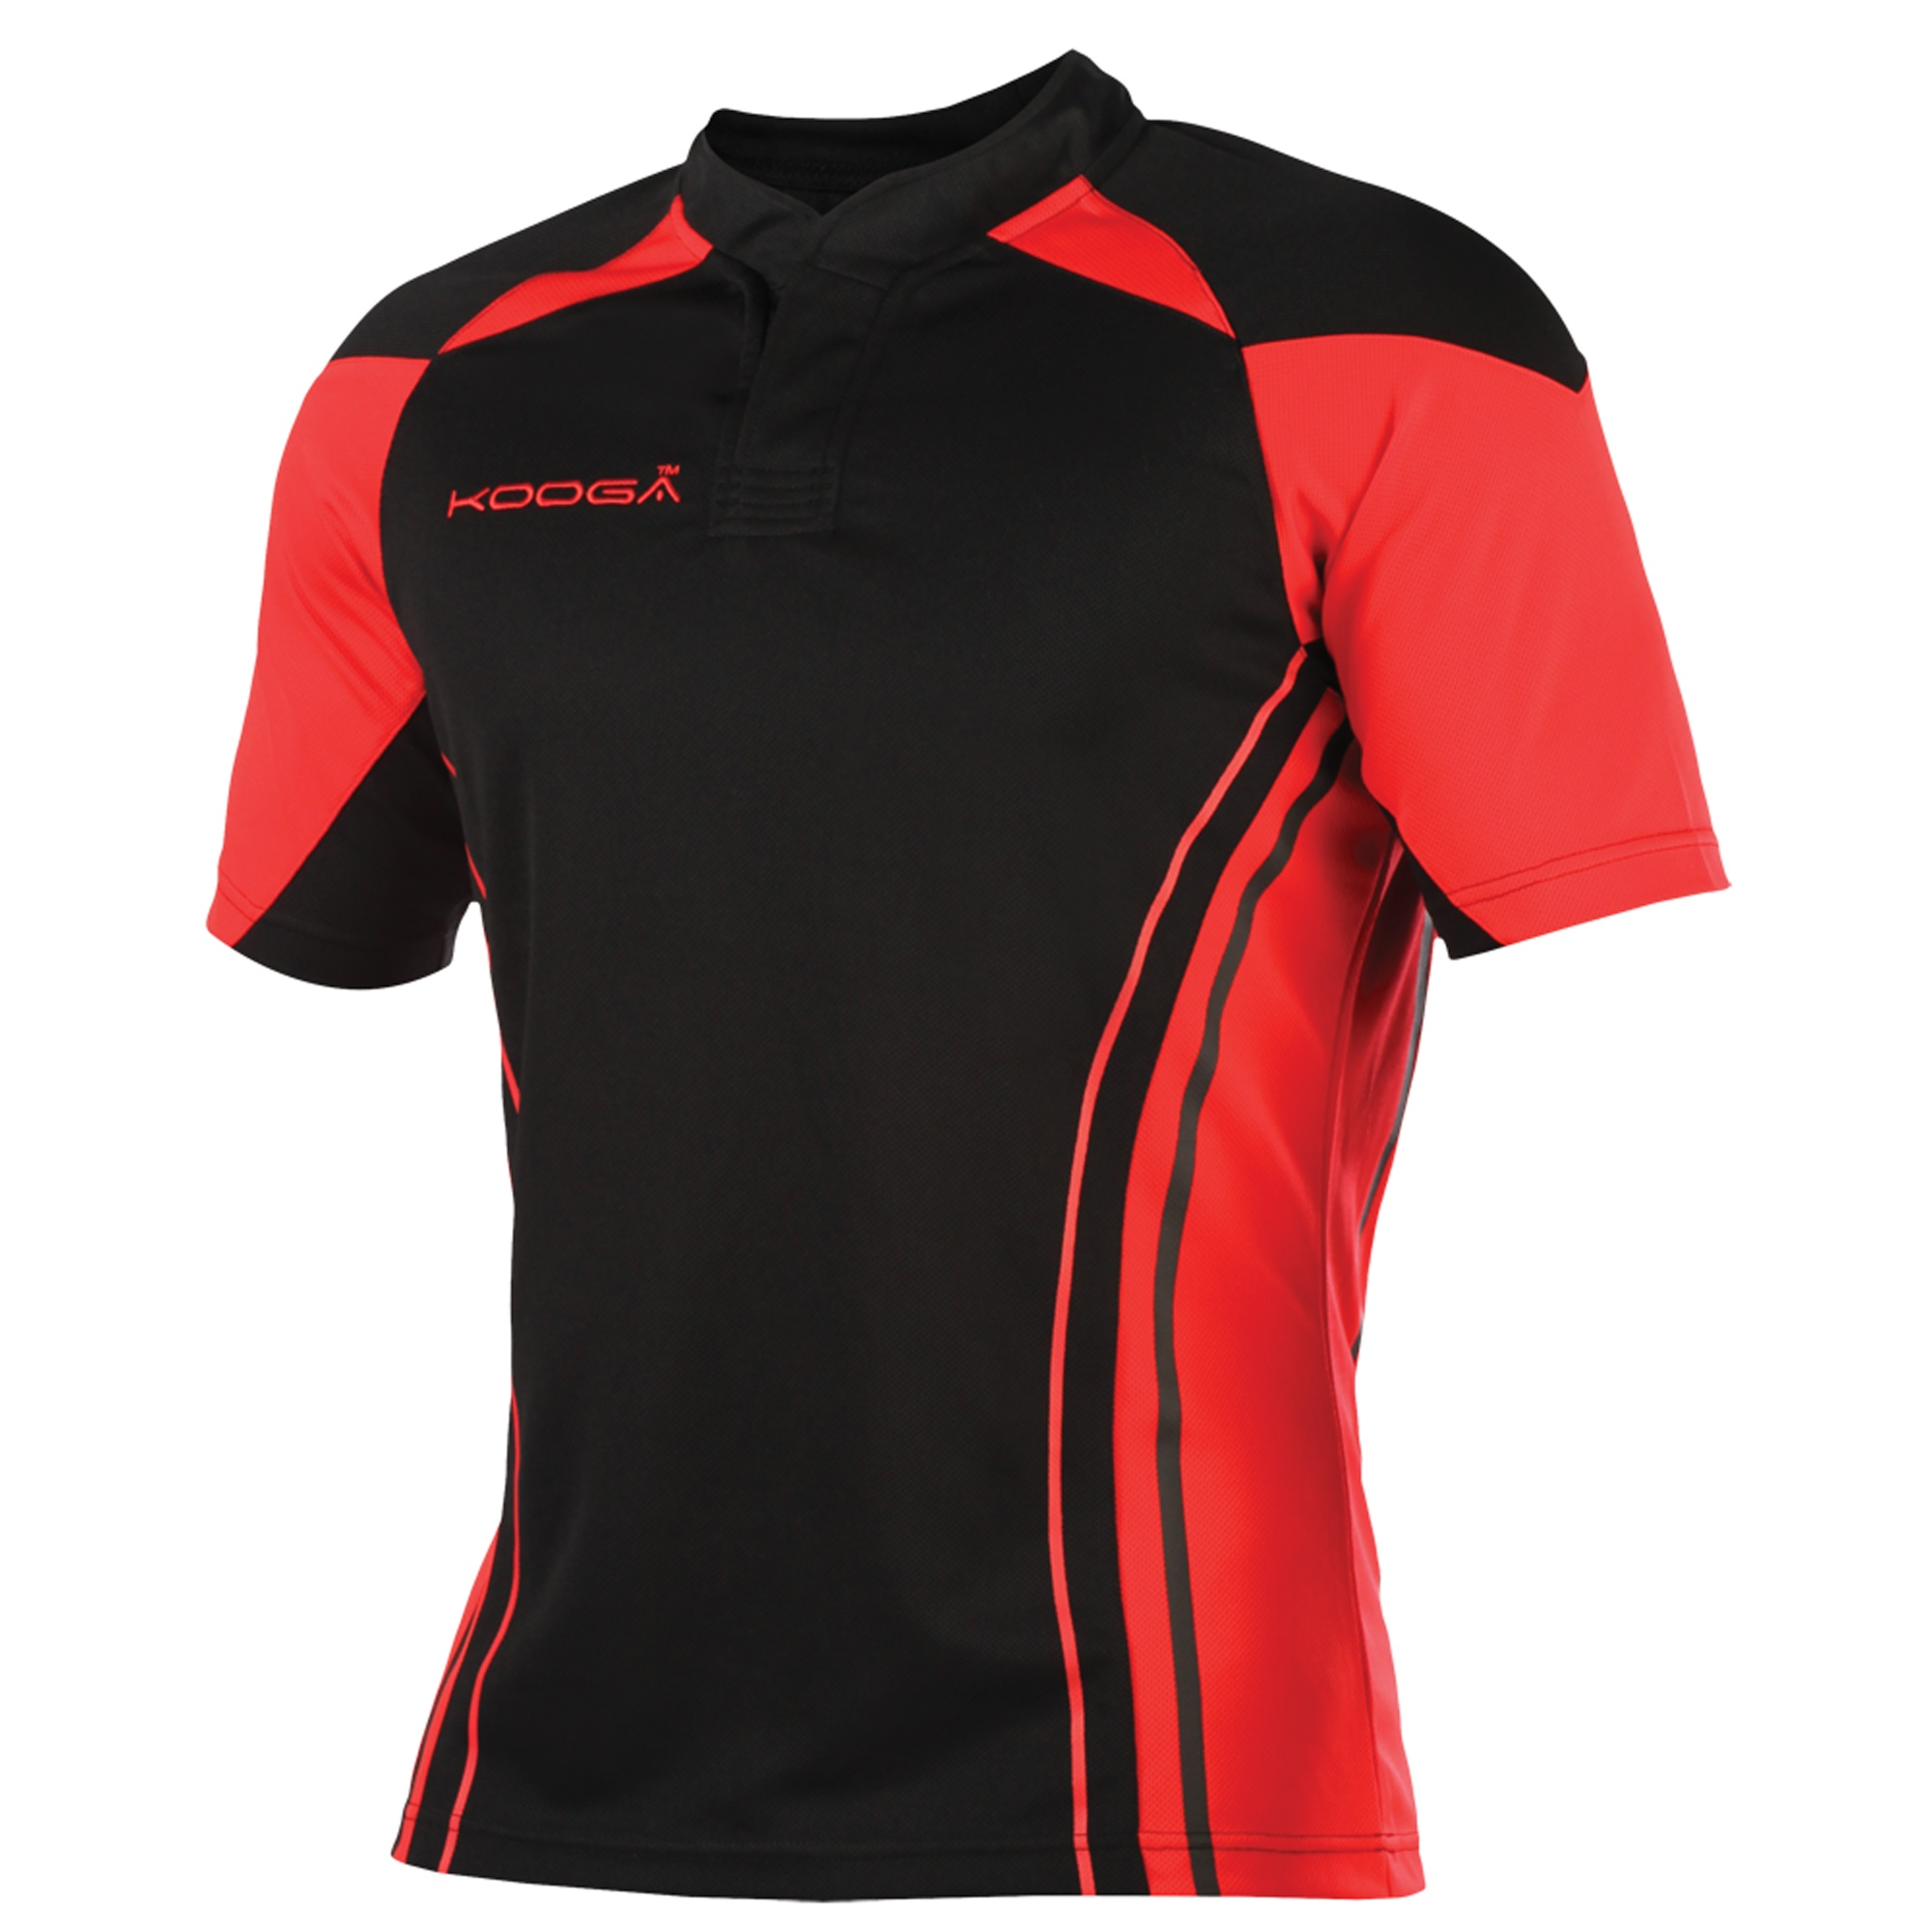 KooGa Boys Junior Stadium Match Rugby Shirt (L) (Black/Red)